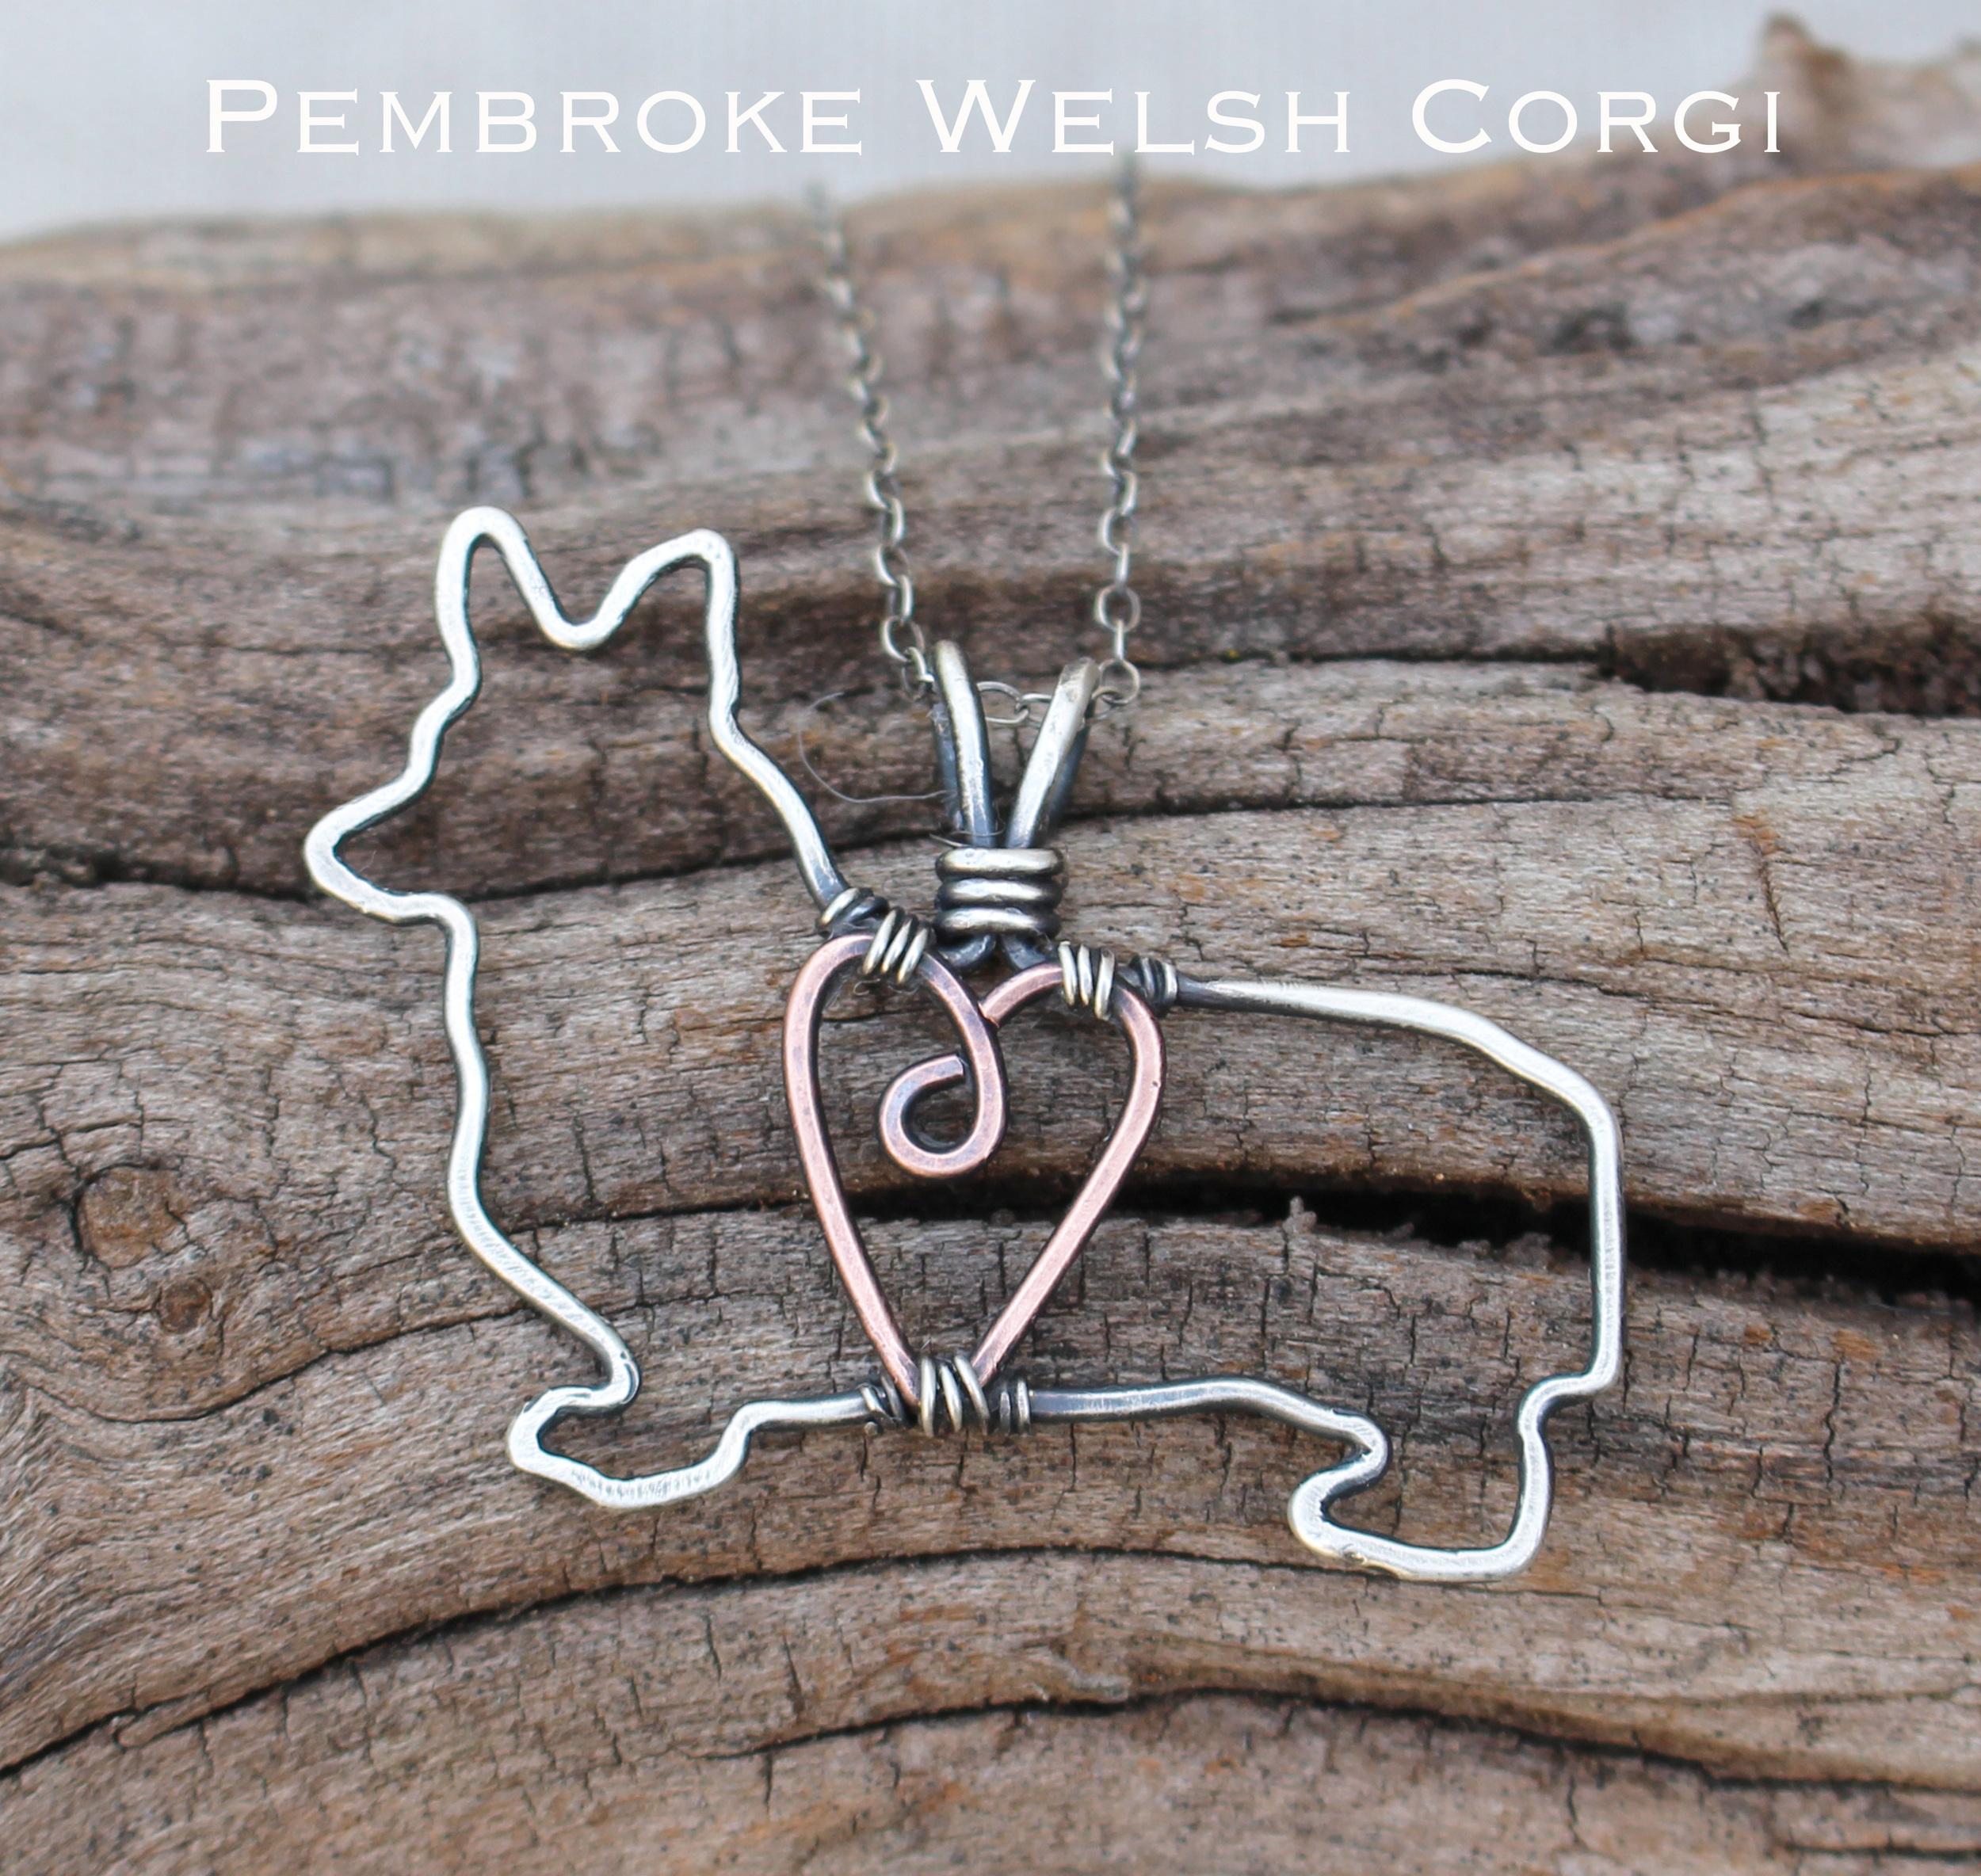 Pembroke Welsh Corgi2.jpg